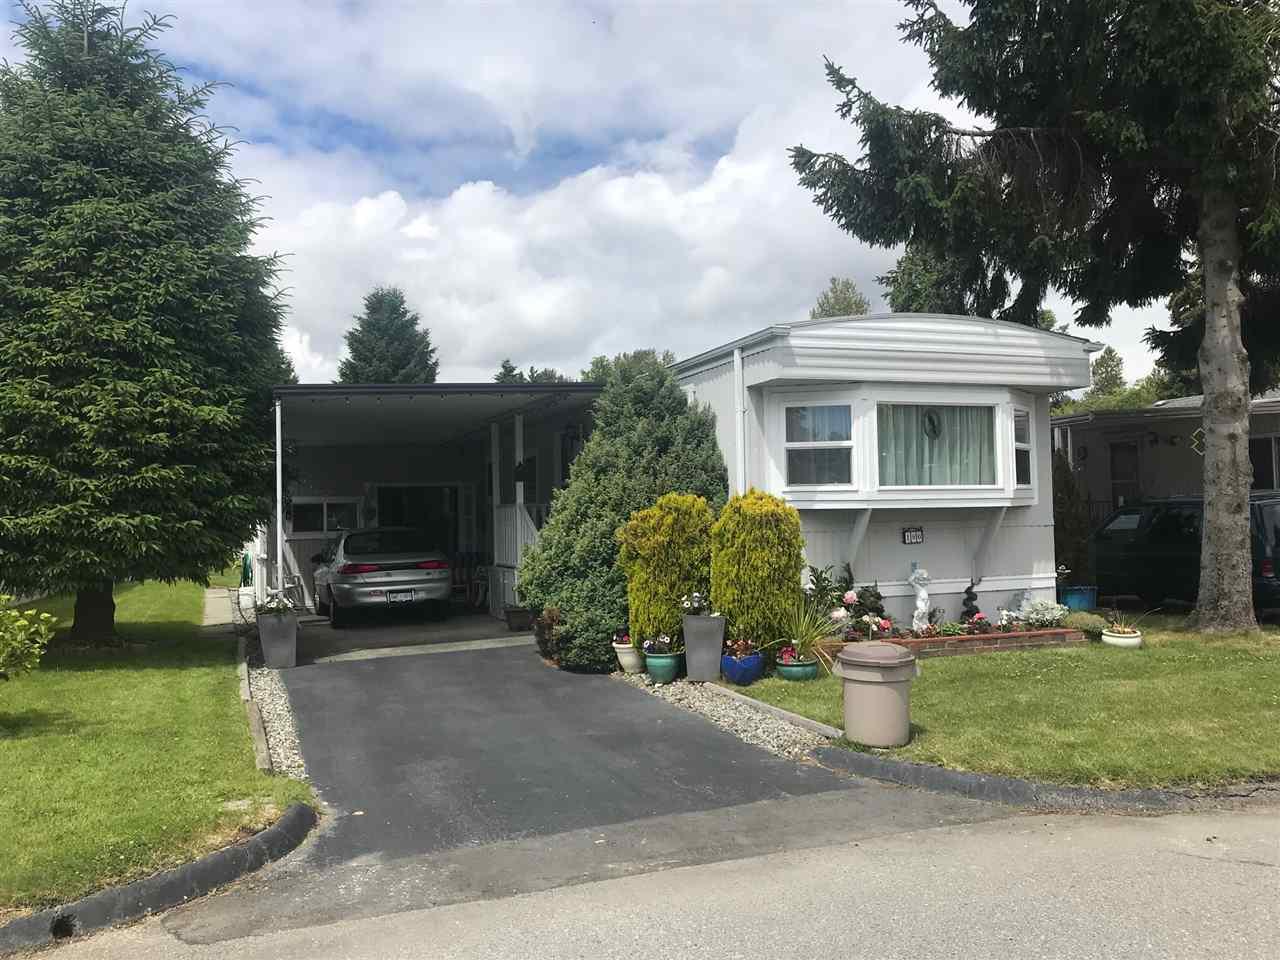 Sold: 180 - 1840 160 Street, Surrey, BC